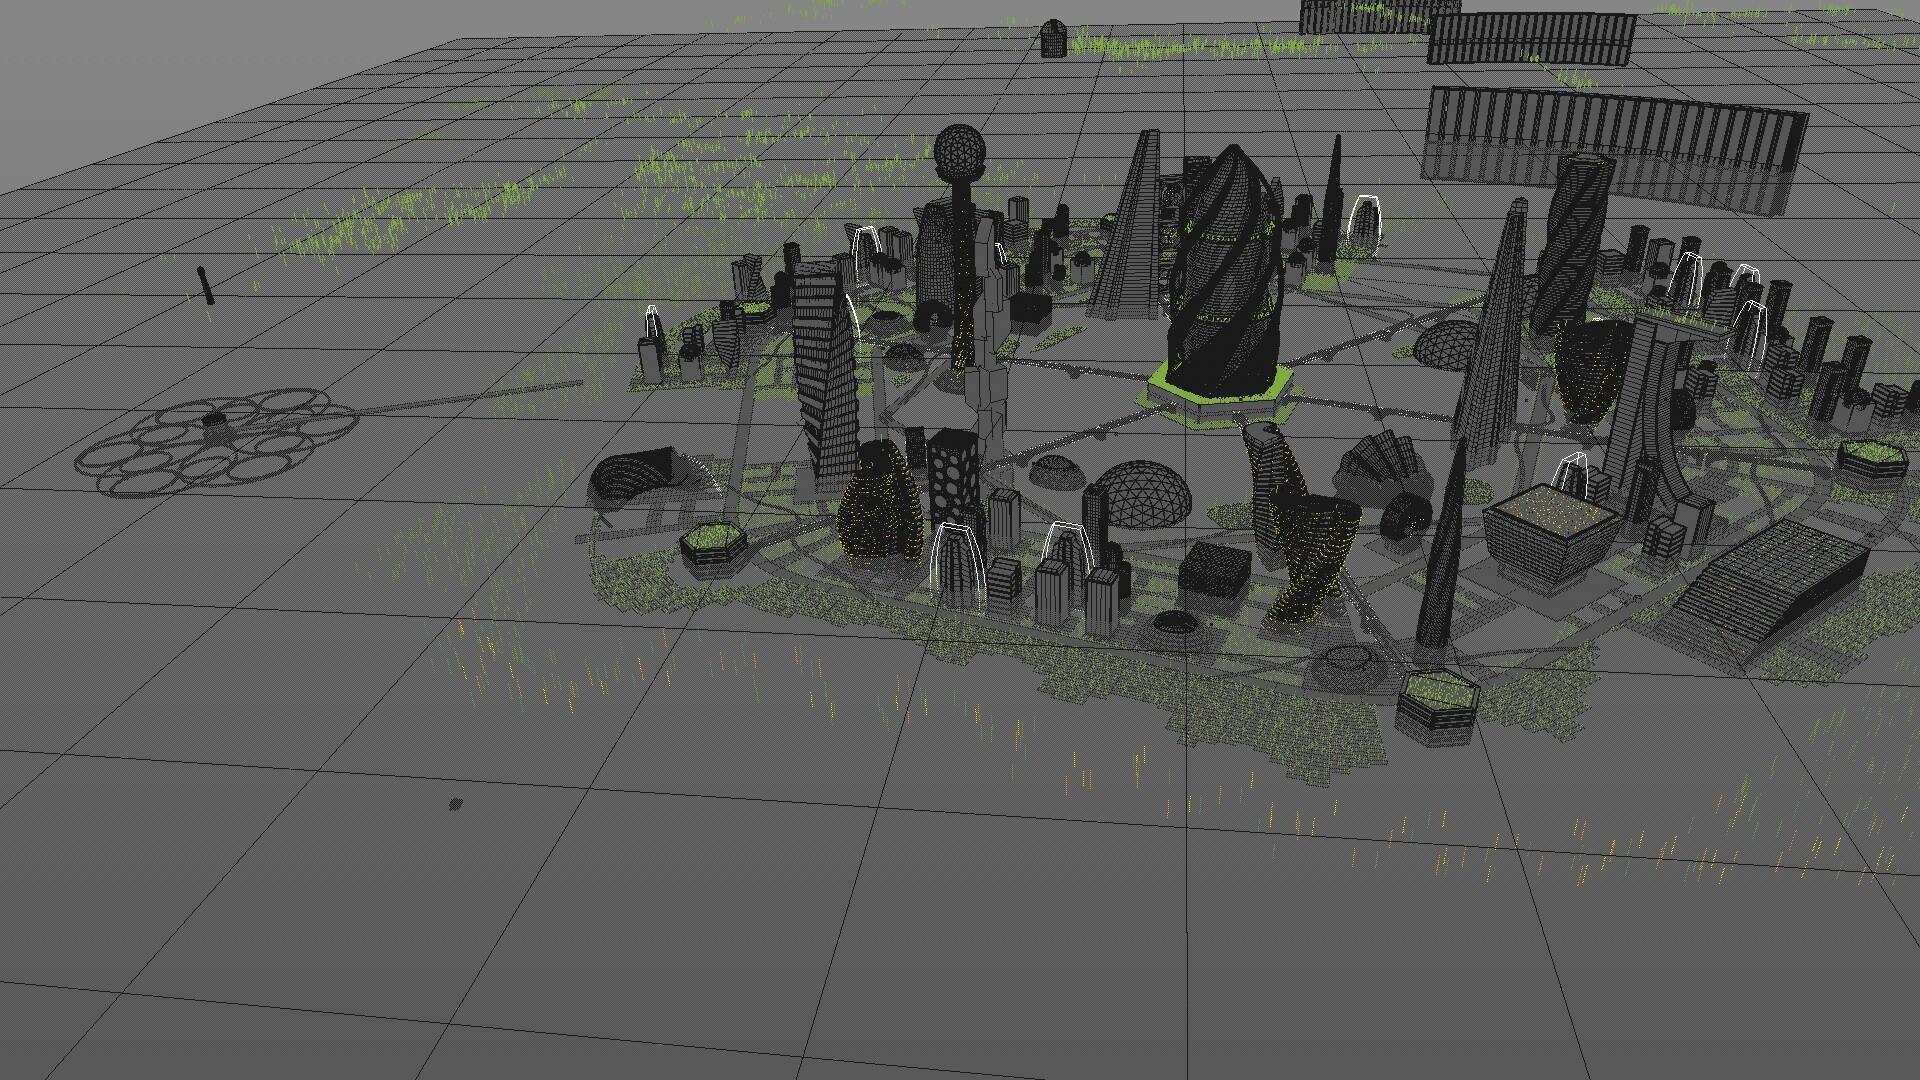 ArtStation - Toni planells's submission on NVIDIA Metropia